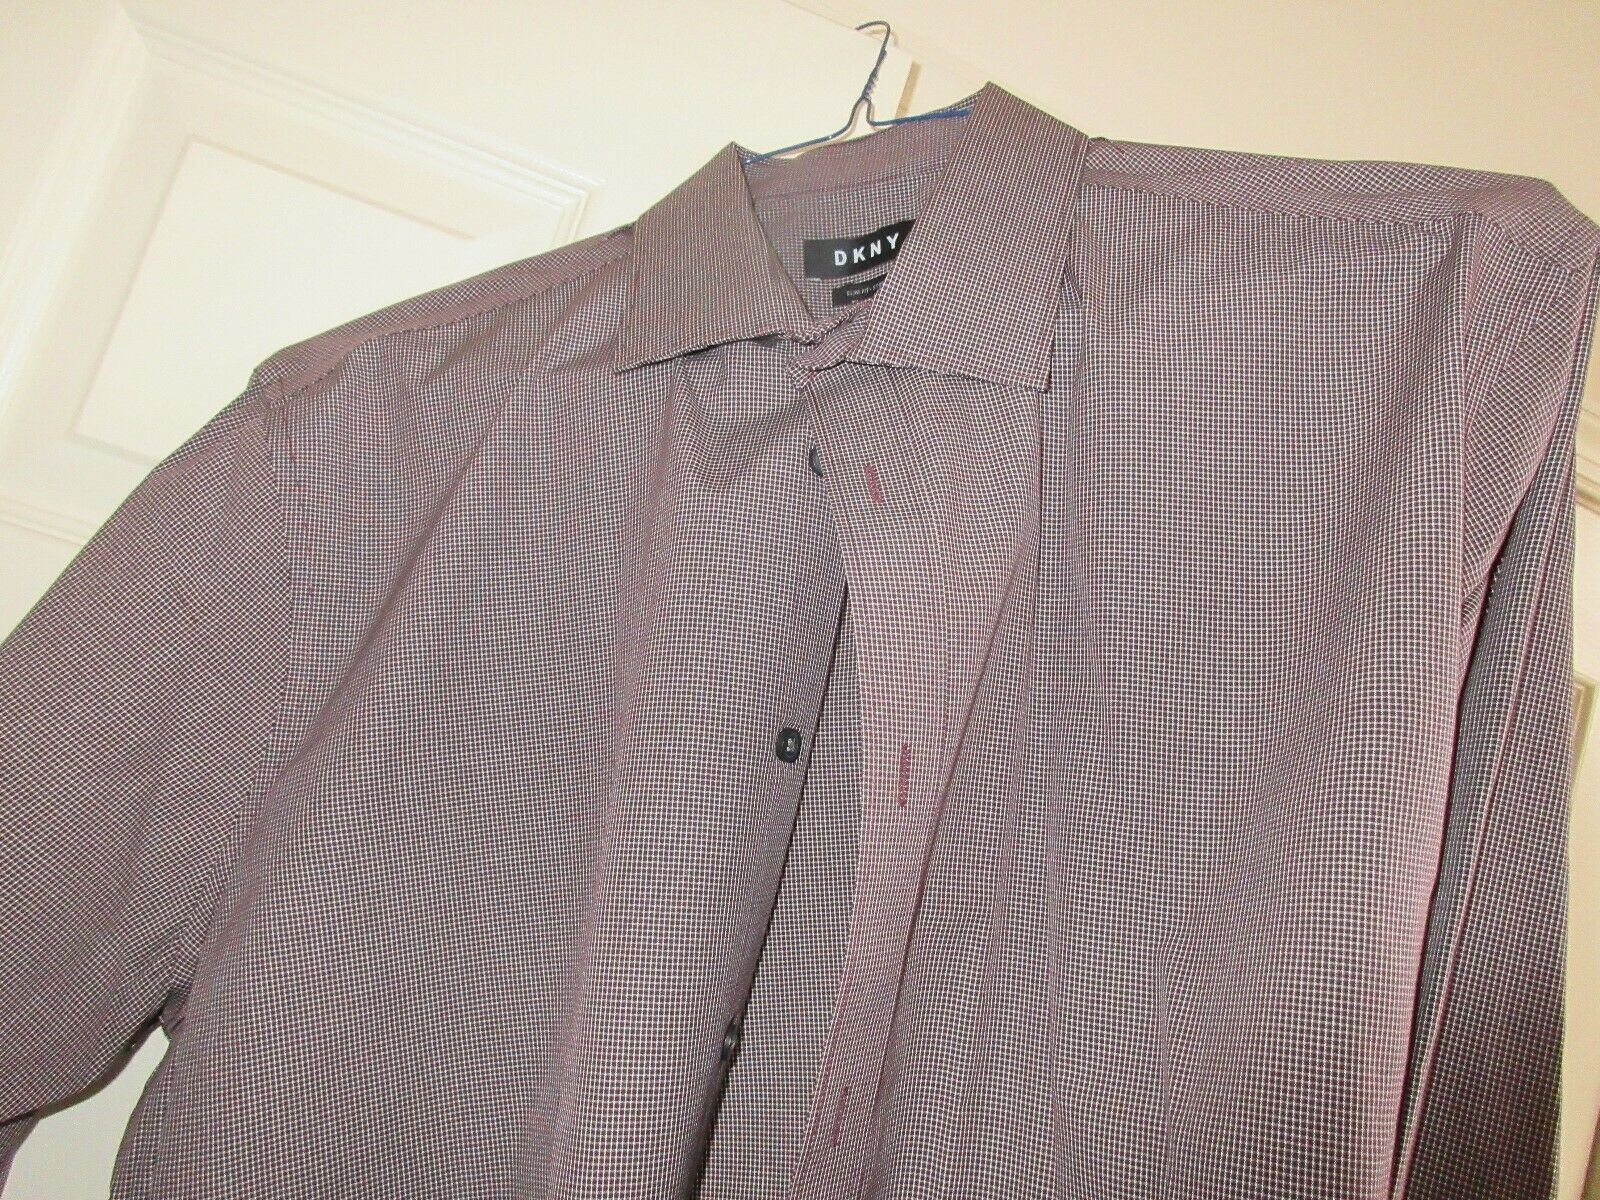 DKNY , Slim Fit-Stretch, 17 34/35 , 96% Cotton 4% Elast